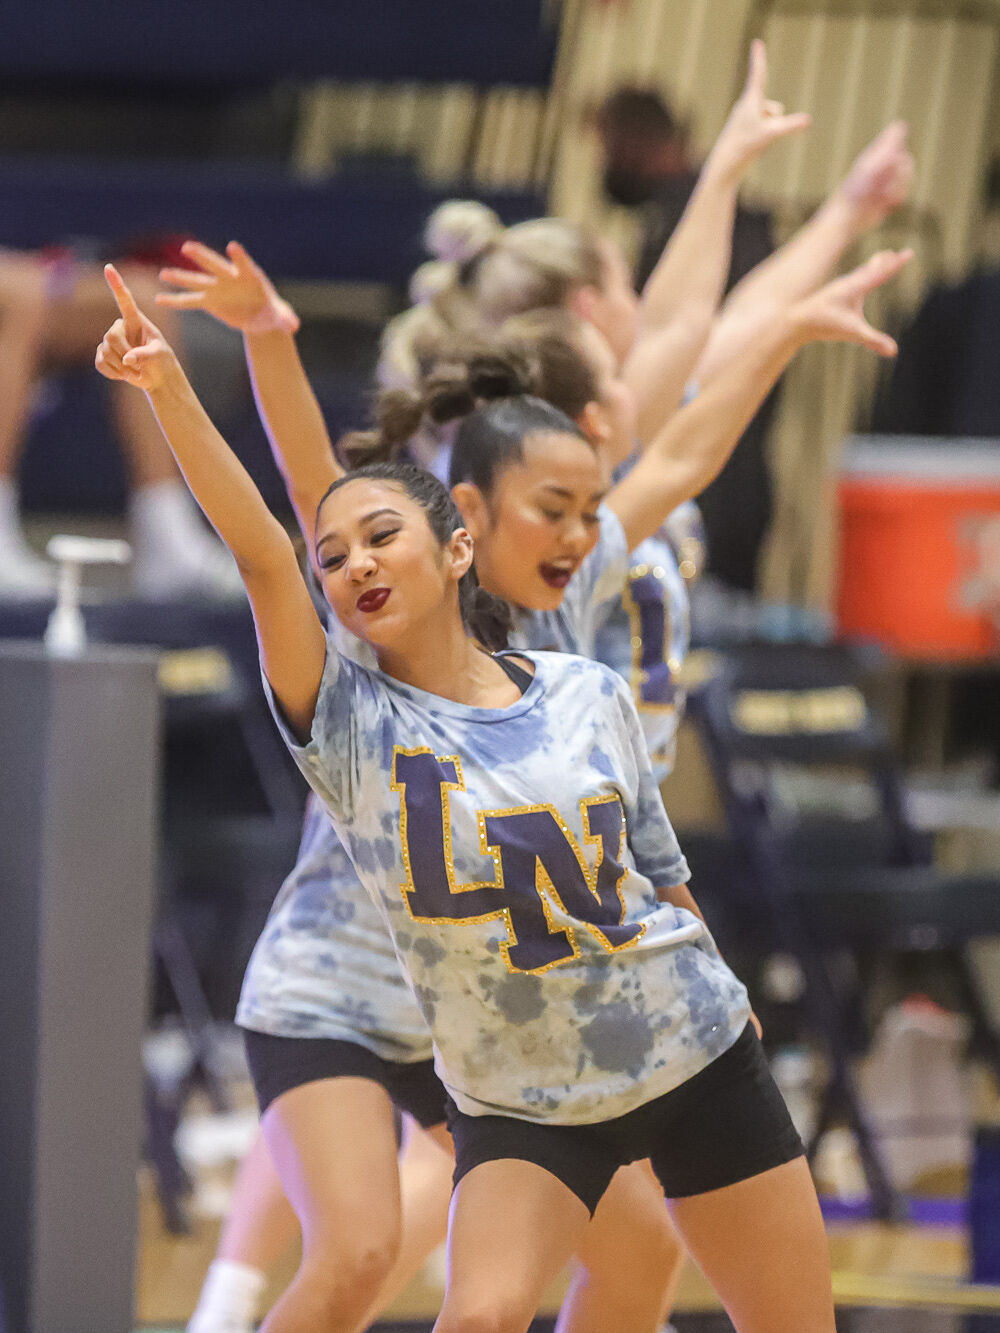 Liberty North Golden Girls Dance Team Halftime Performance at Crosstown Showdown-1.jpg